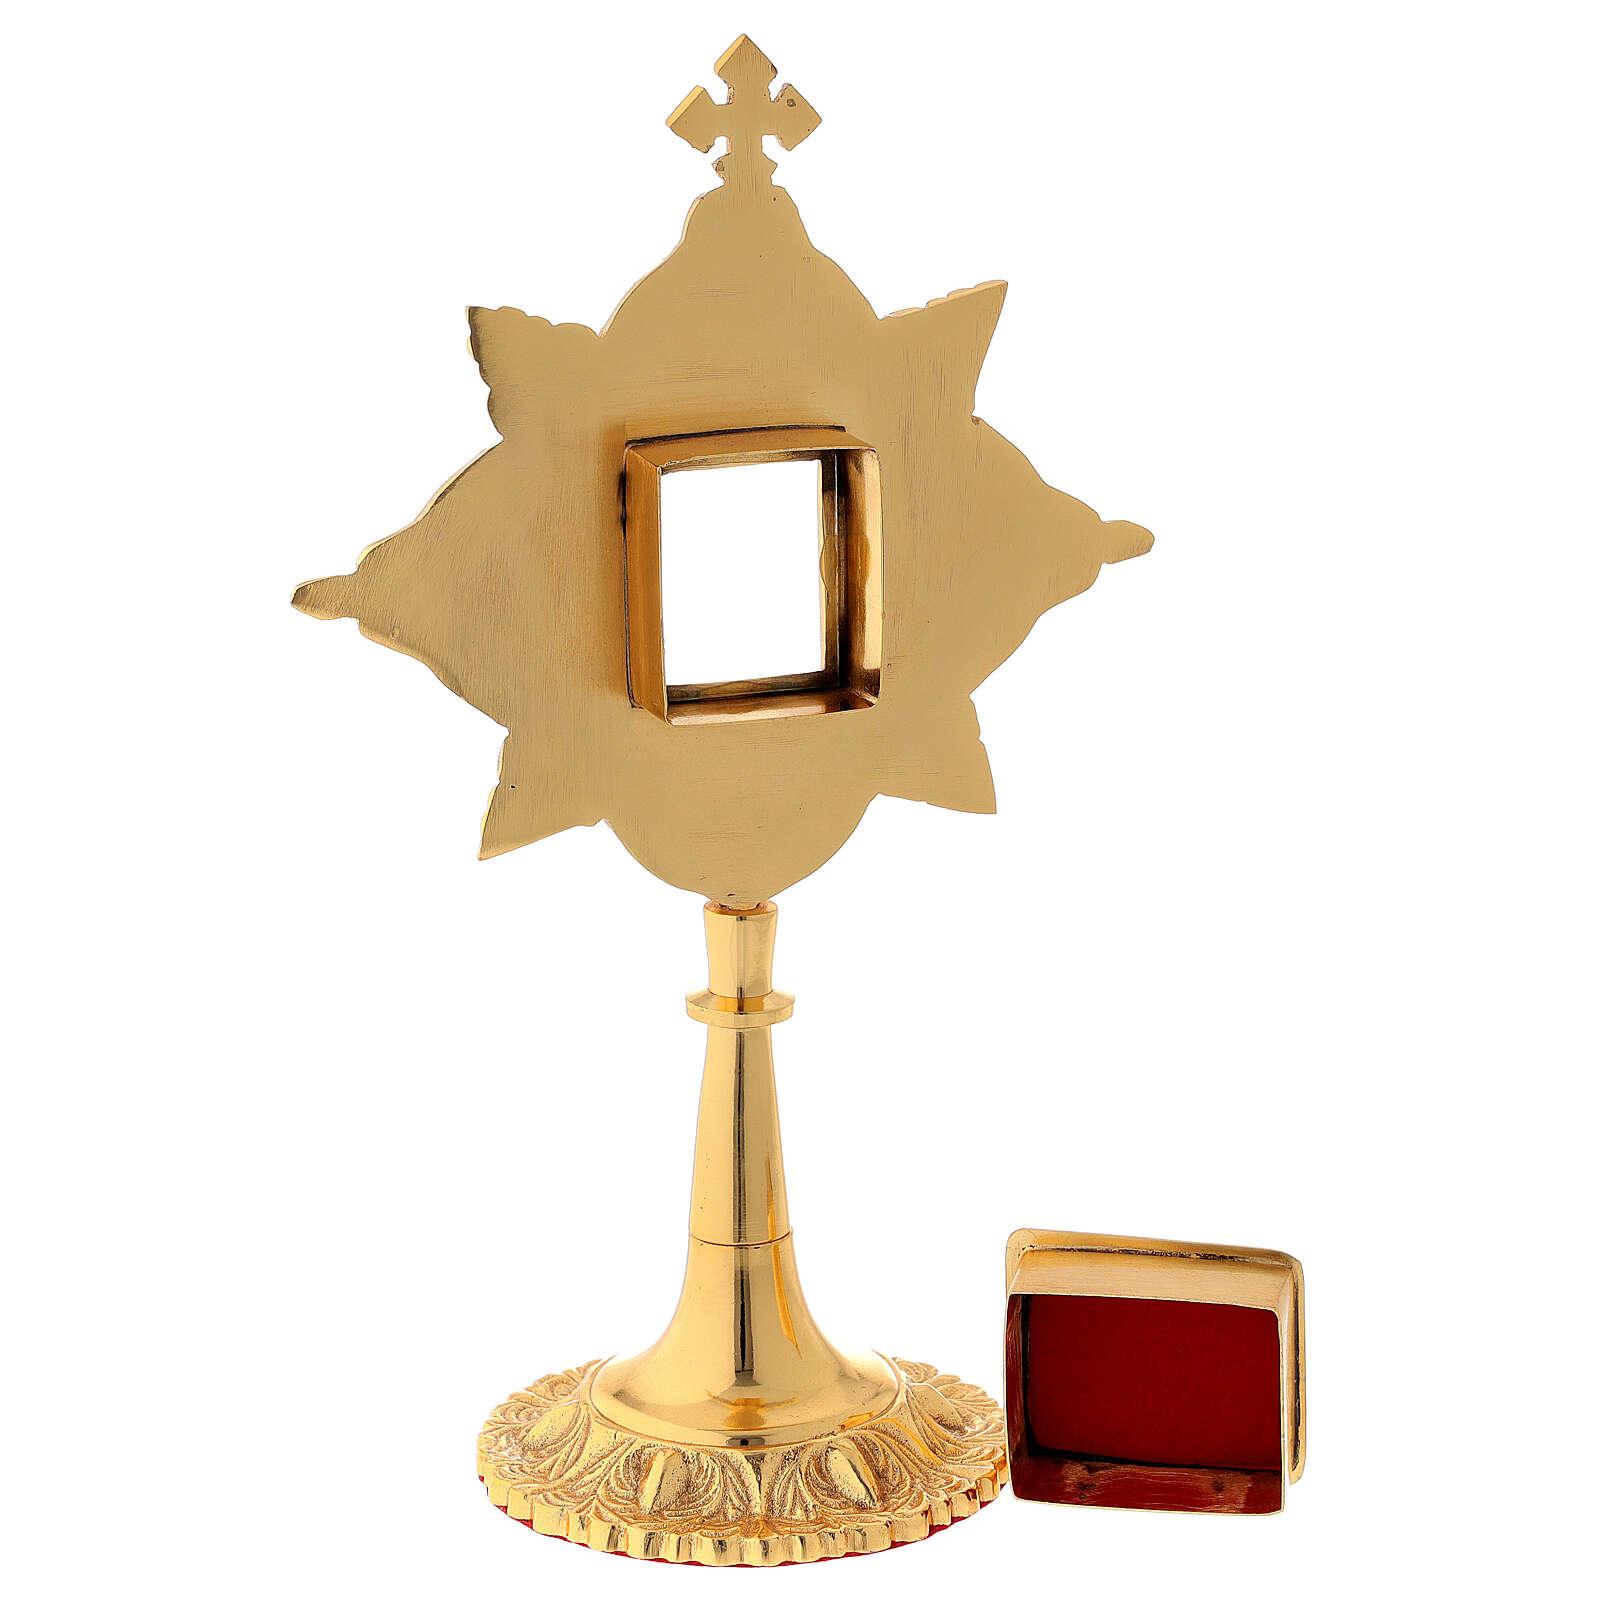 Relicario latón hoja de oro cristales 4,5x4 cm 4